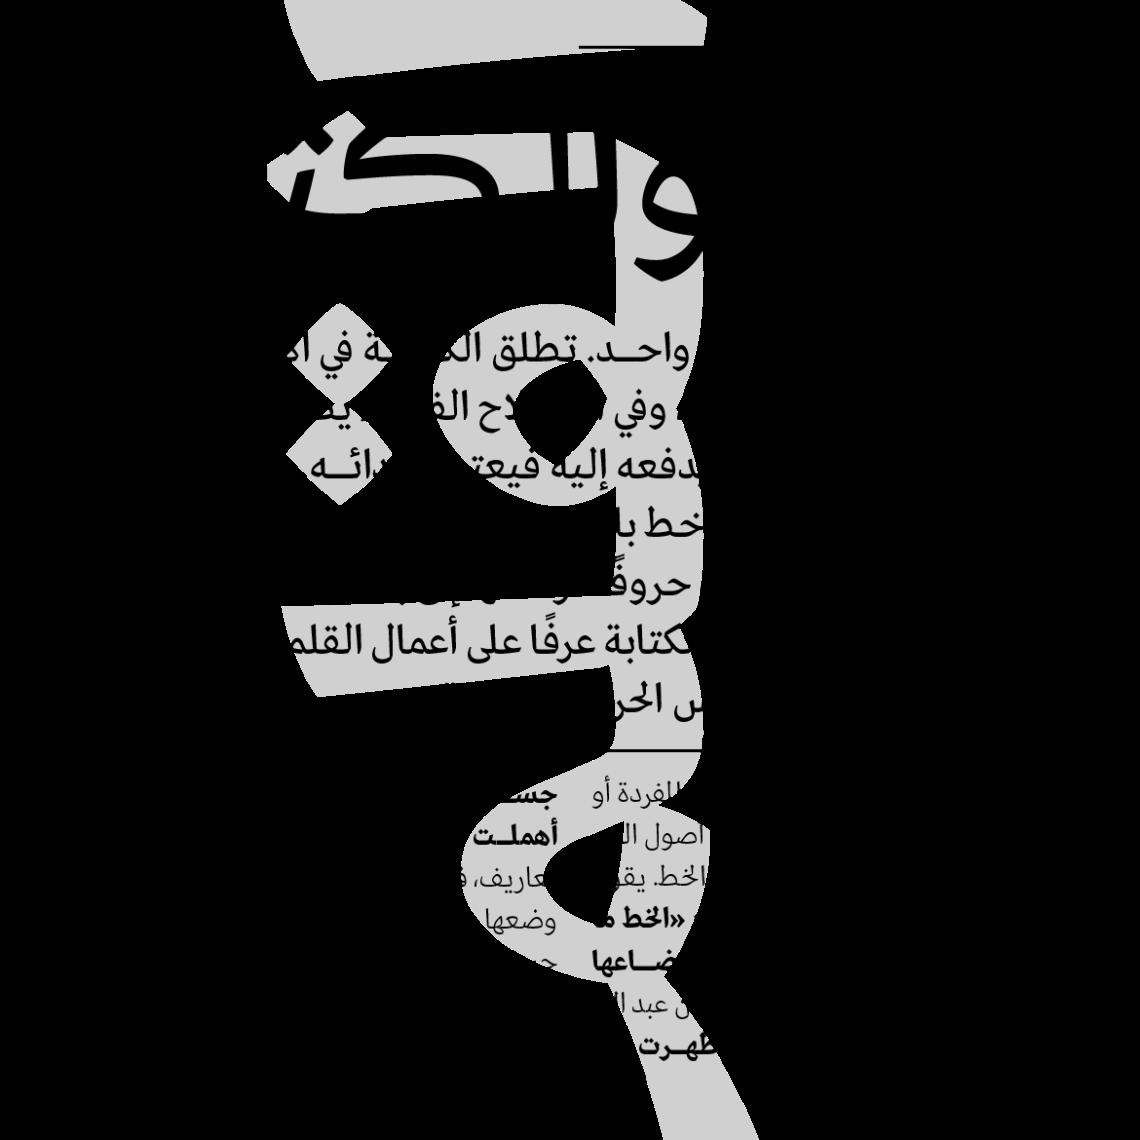 29LT-Zarid-Text-Image-22